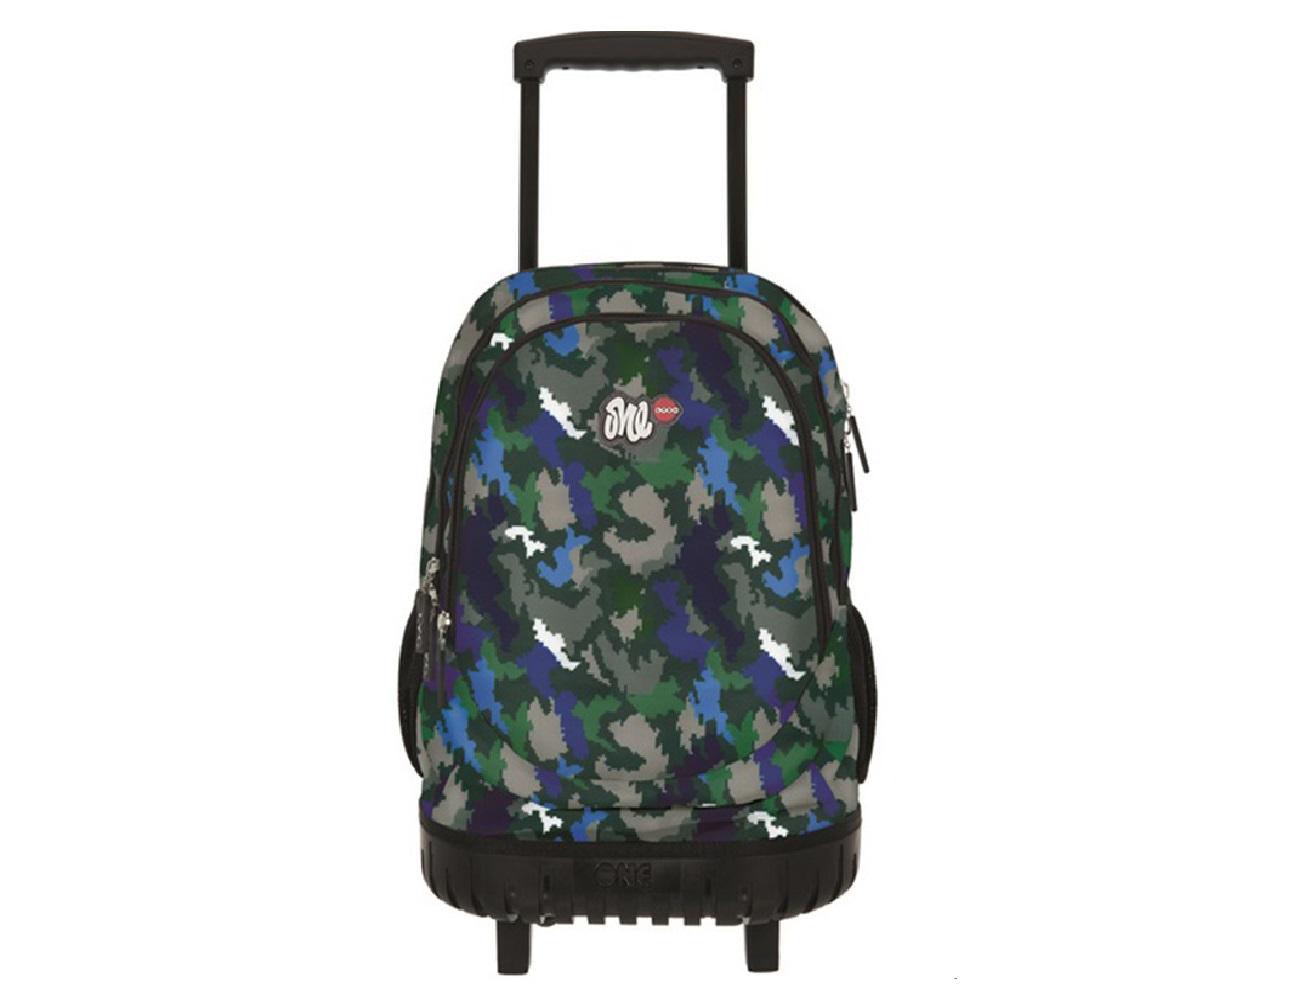 fb9e3d2dbfc Σχολική τσάντα Τρόλεϊ LYCsac Camo Pixels - LO82947 - Lexicon Shop